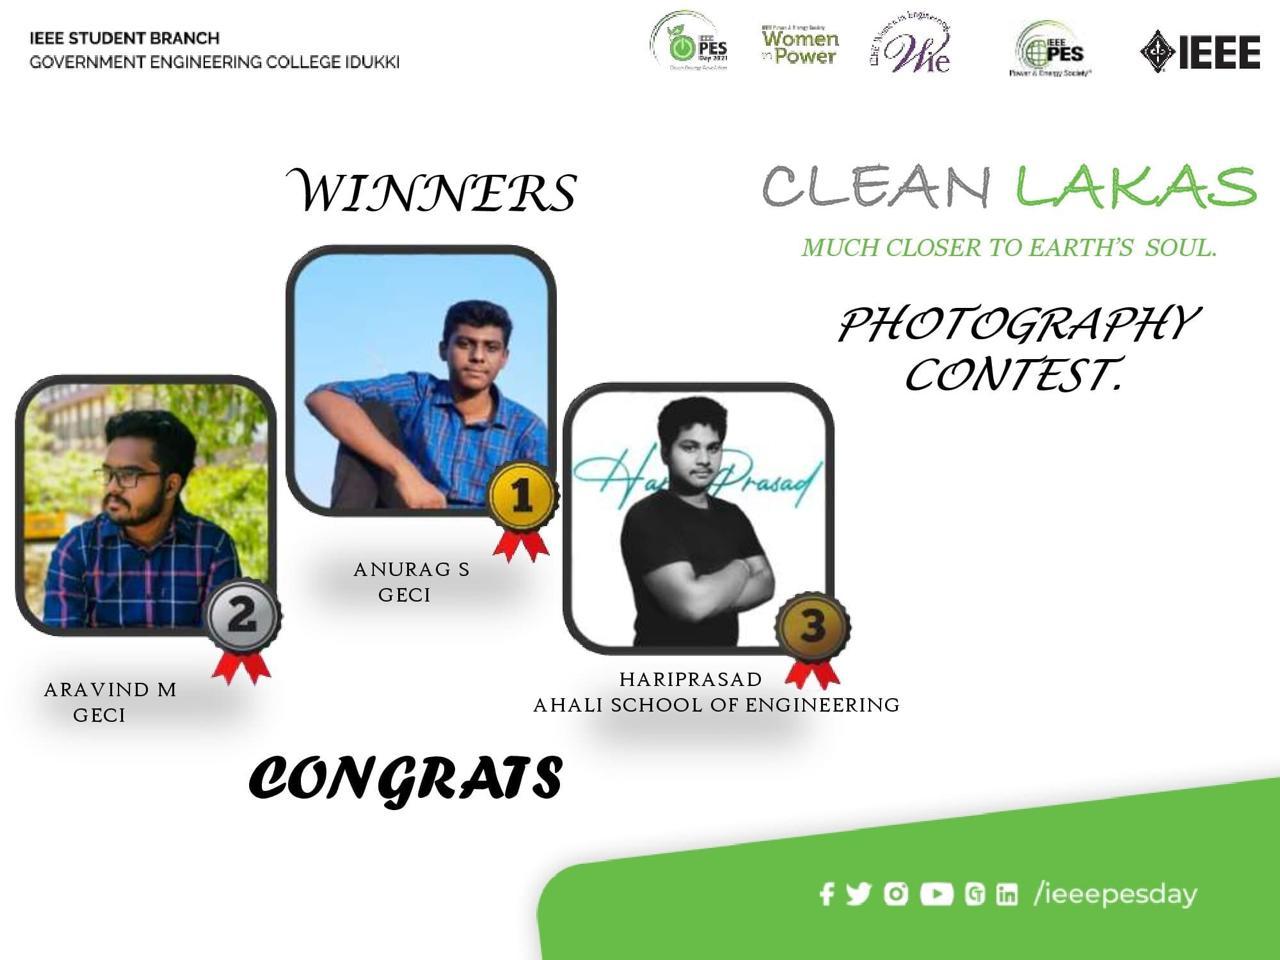 Hariprasad wins Photography Contest